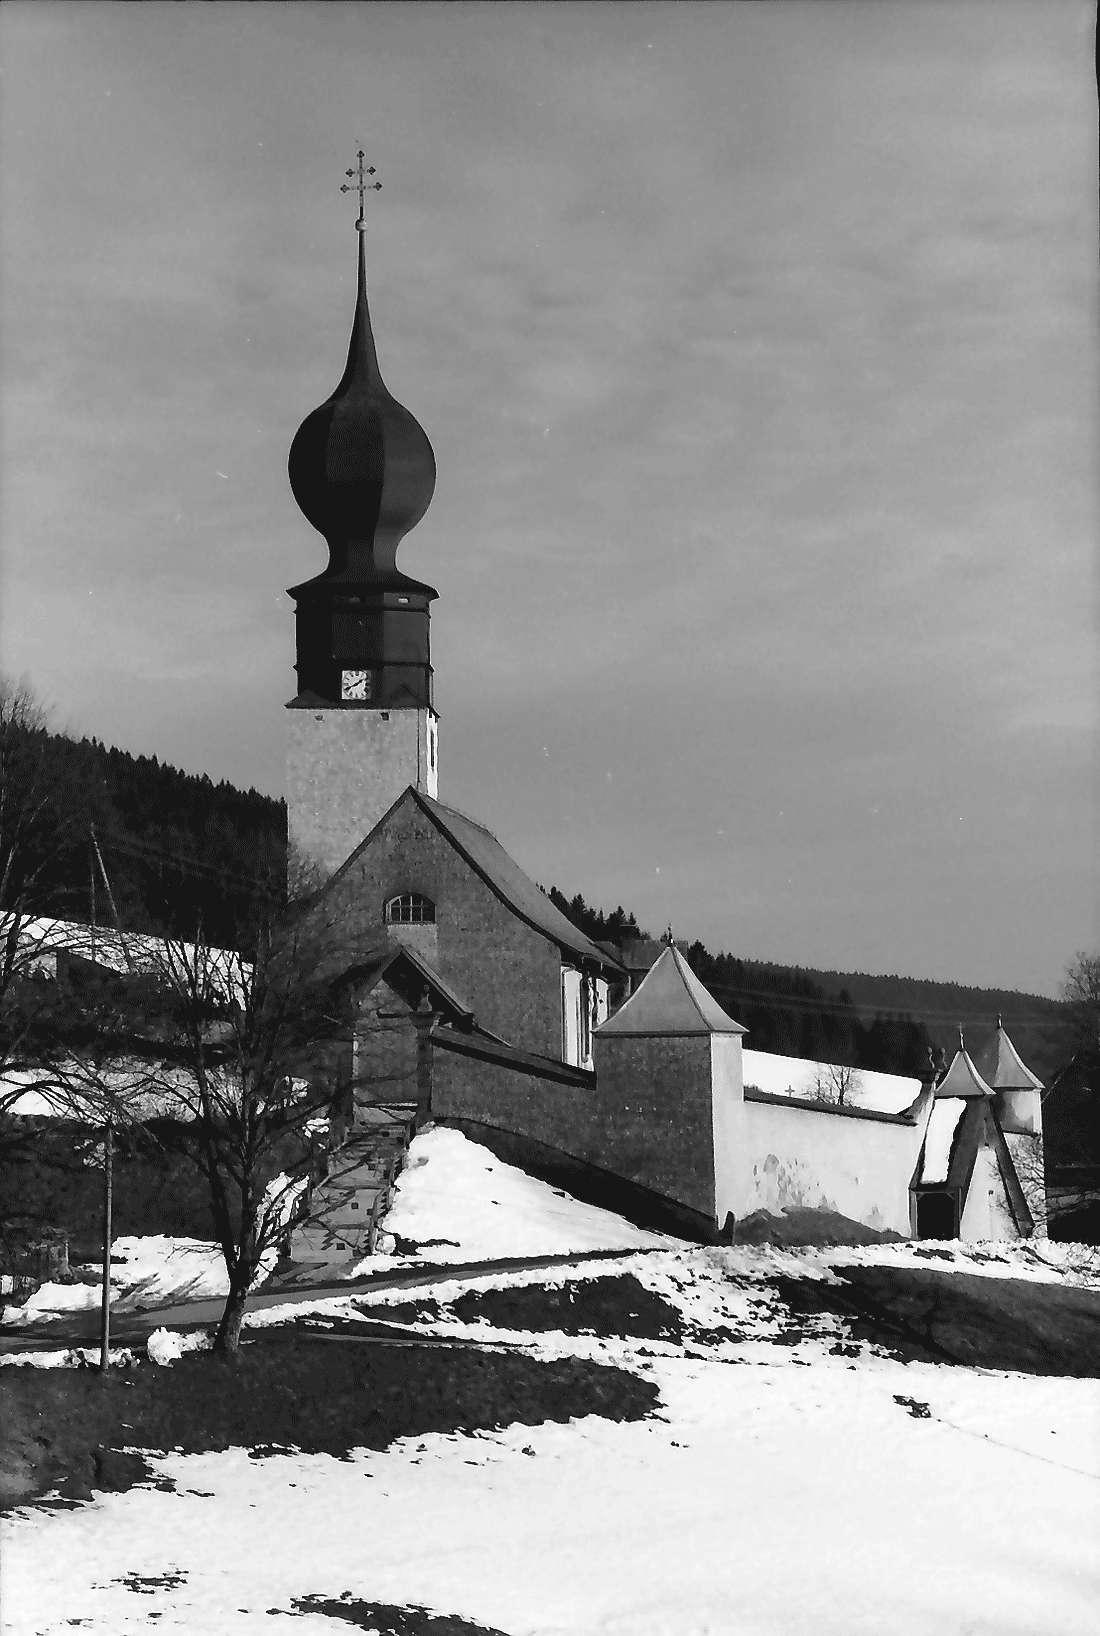 Urach: Kirche mit Umfriedung, Bild 1